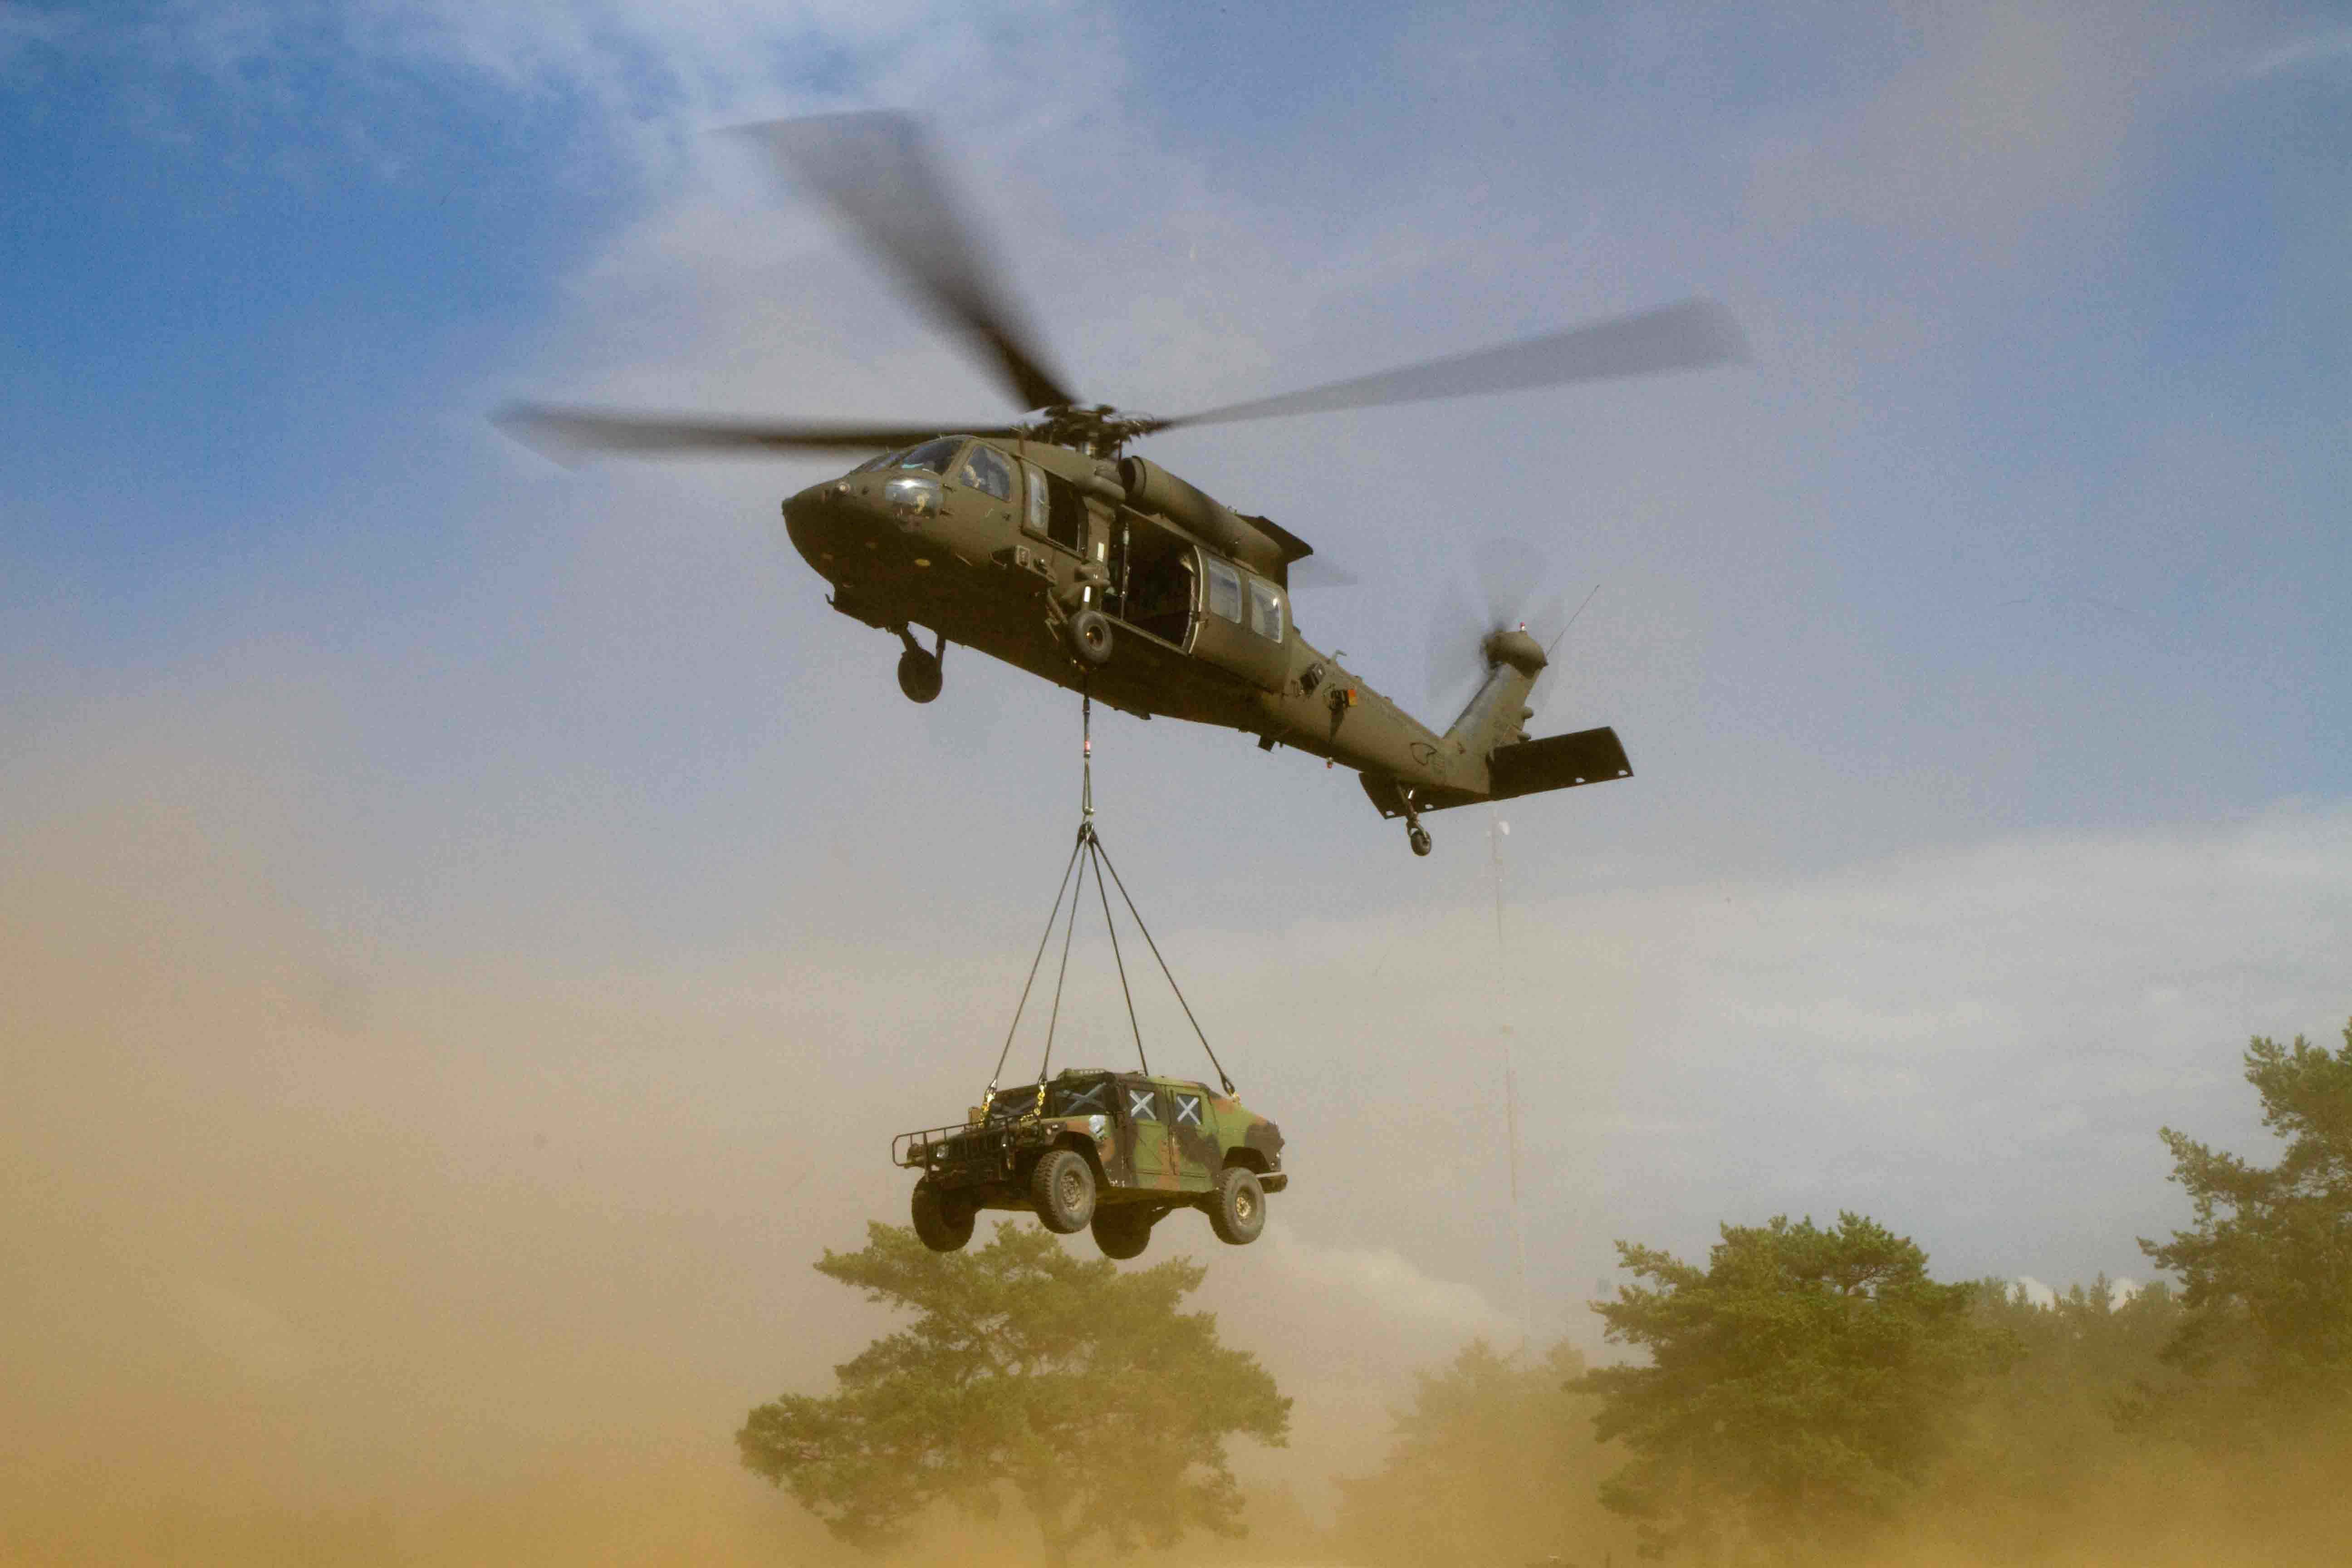 Oshkosh, B'Gosh: The US Military Is Finally Replacing the Humvee